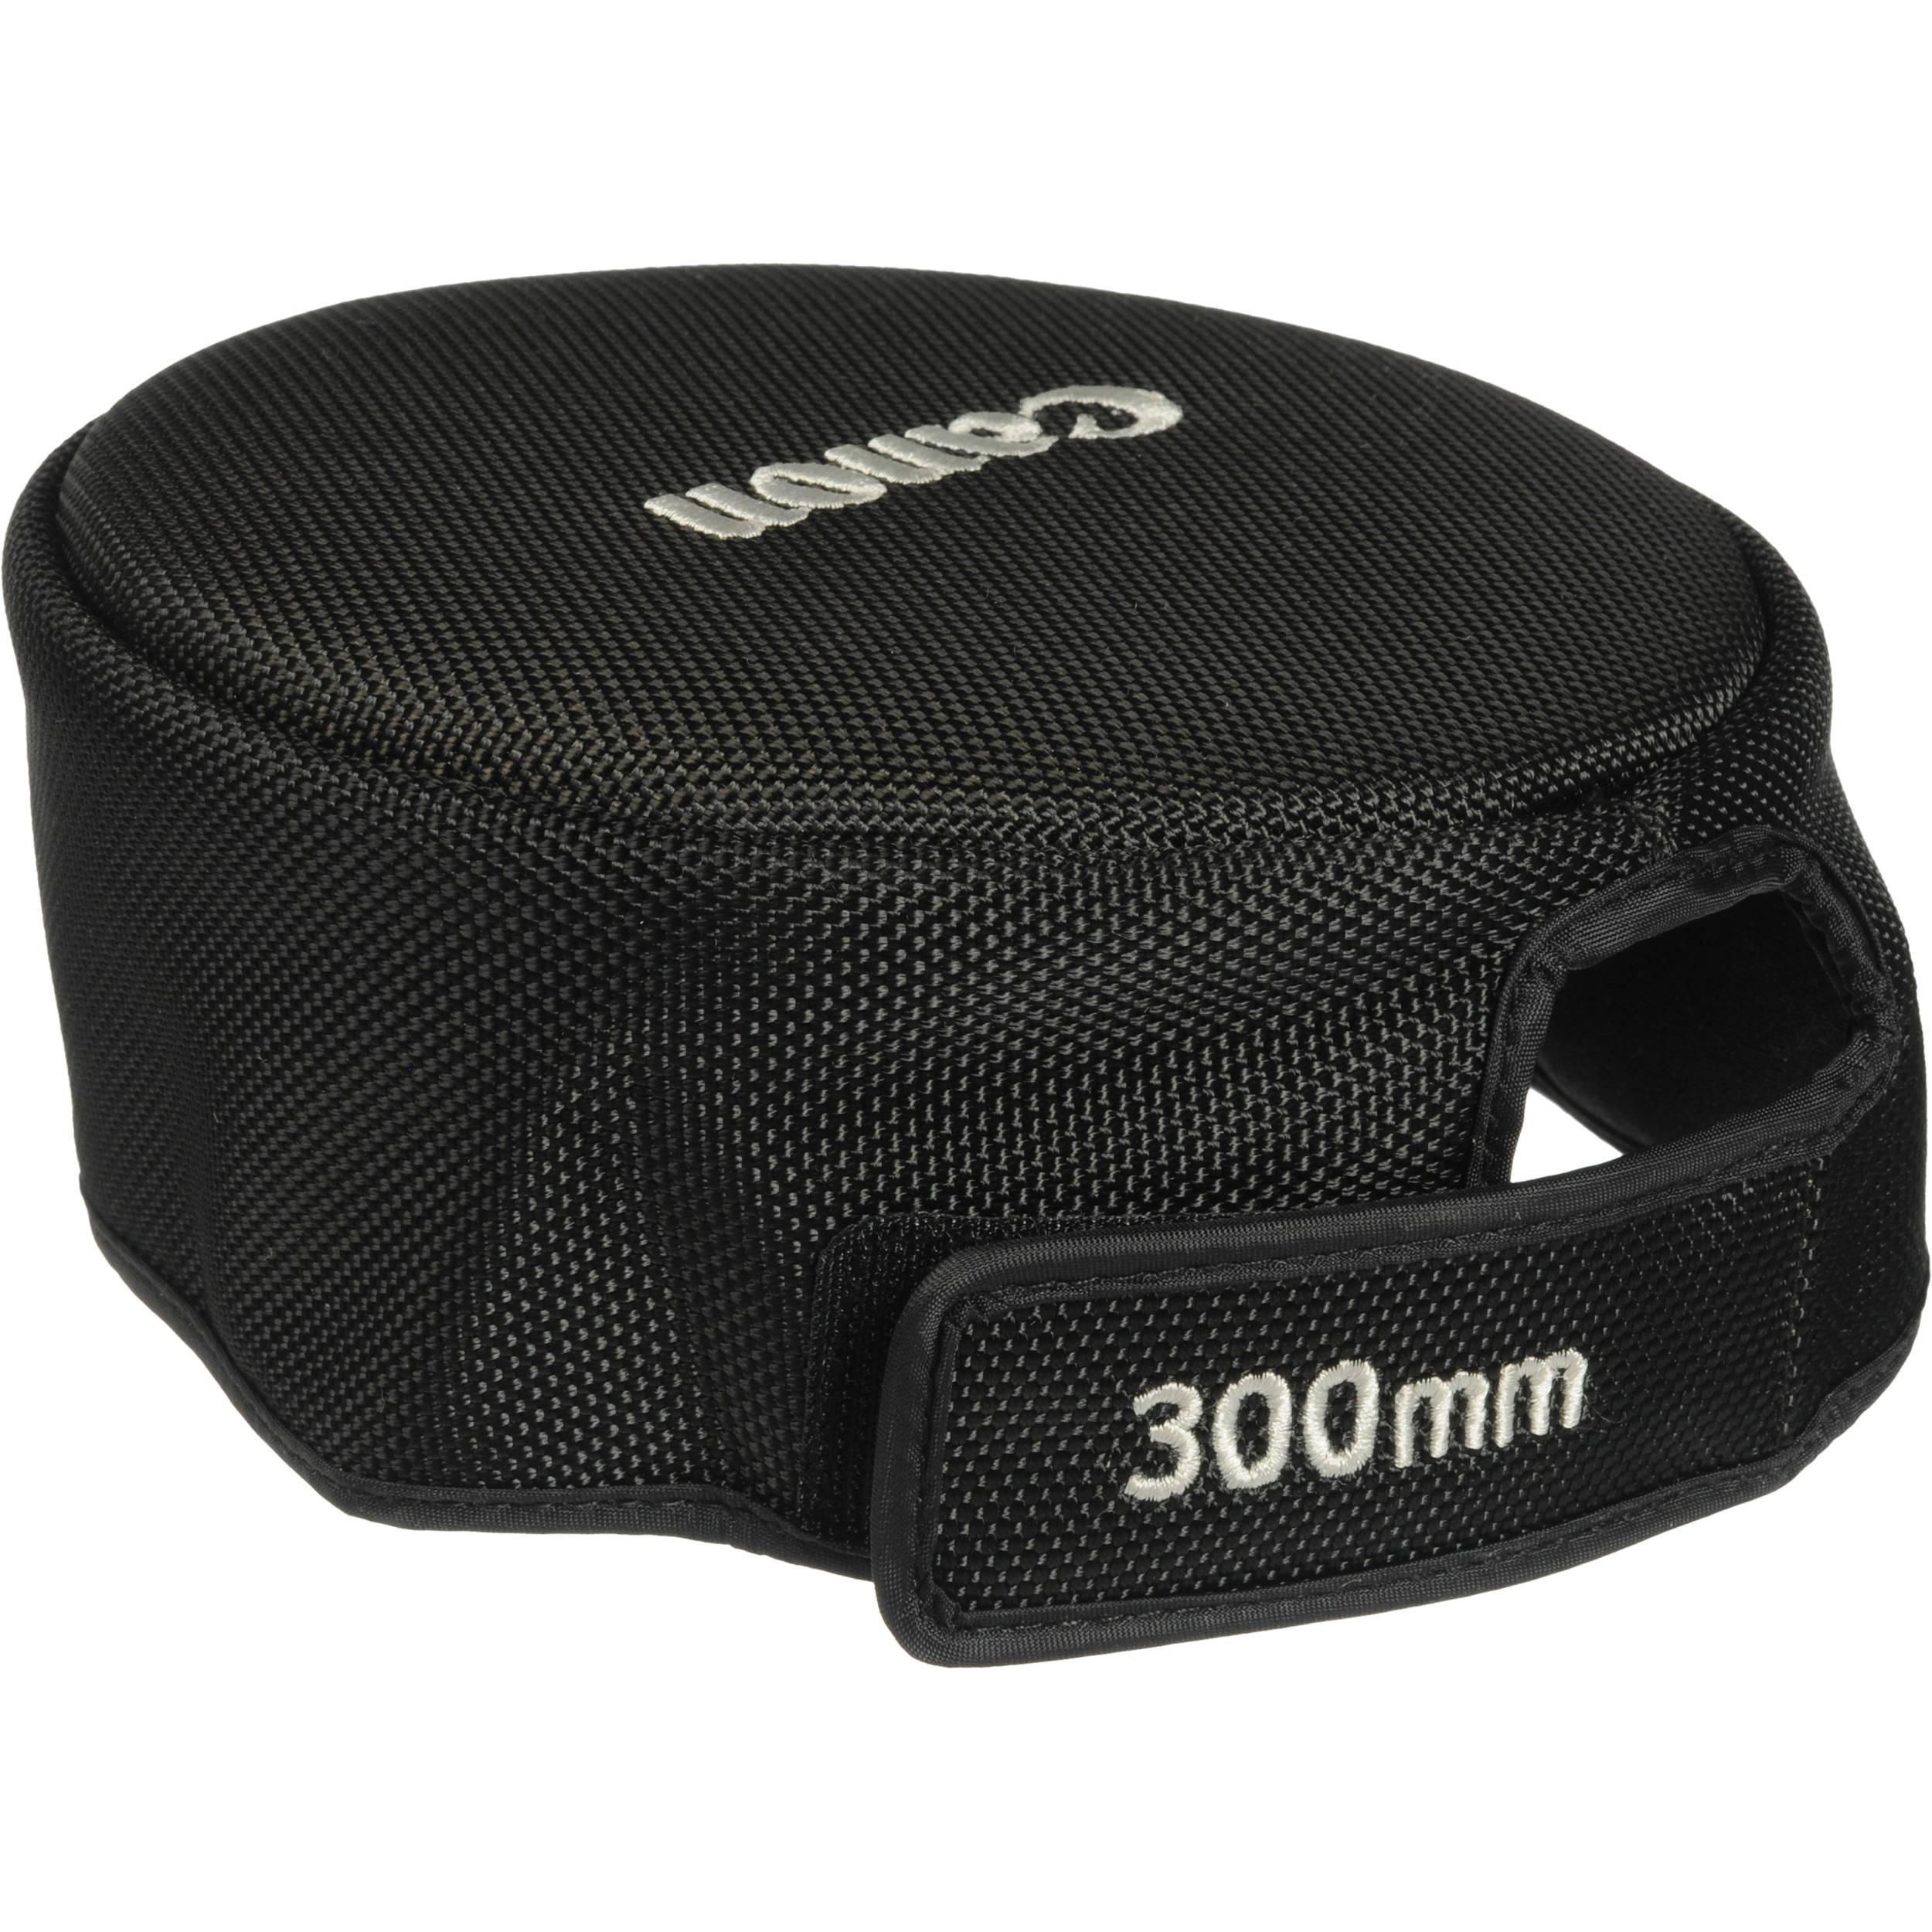 Canon E-145C Lens Cap for EF 300mm f/2.8L IS II USM 4416B001 B&H